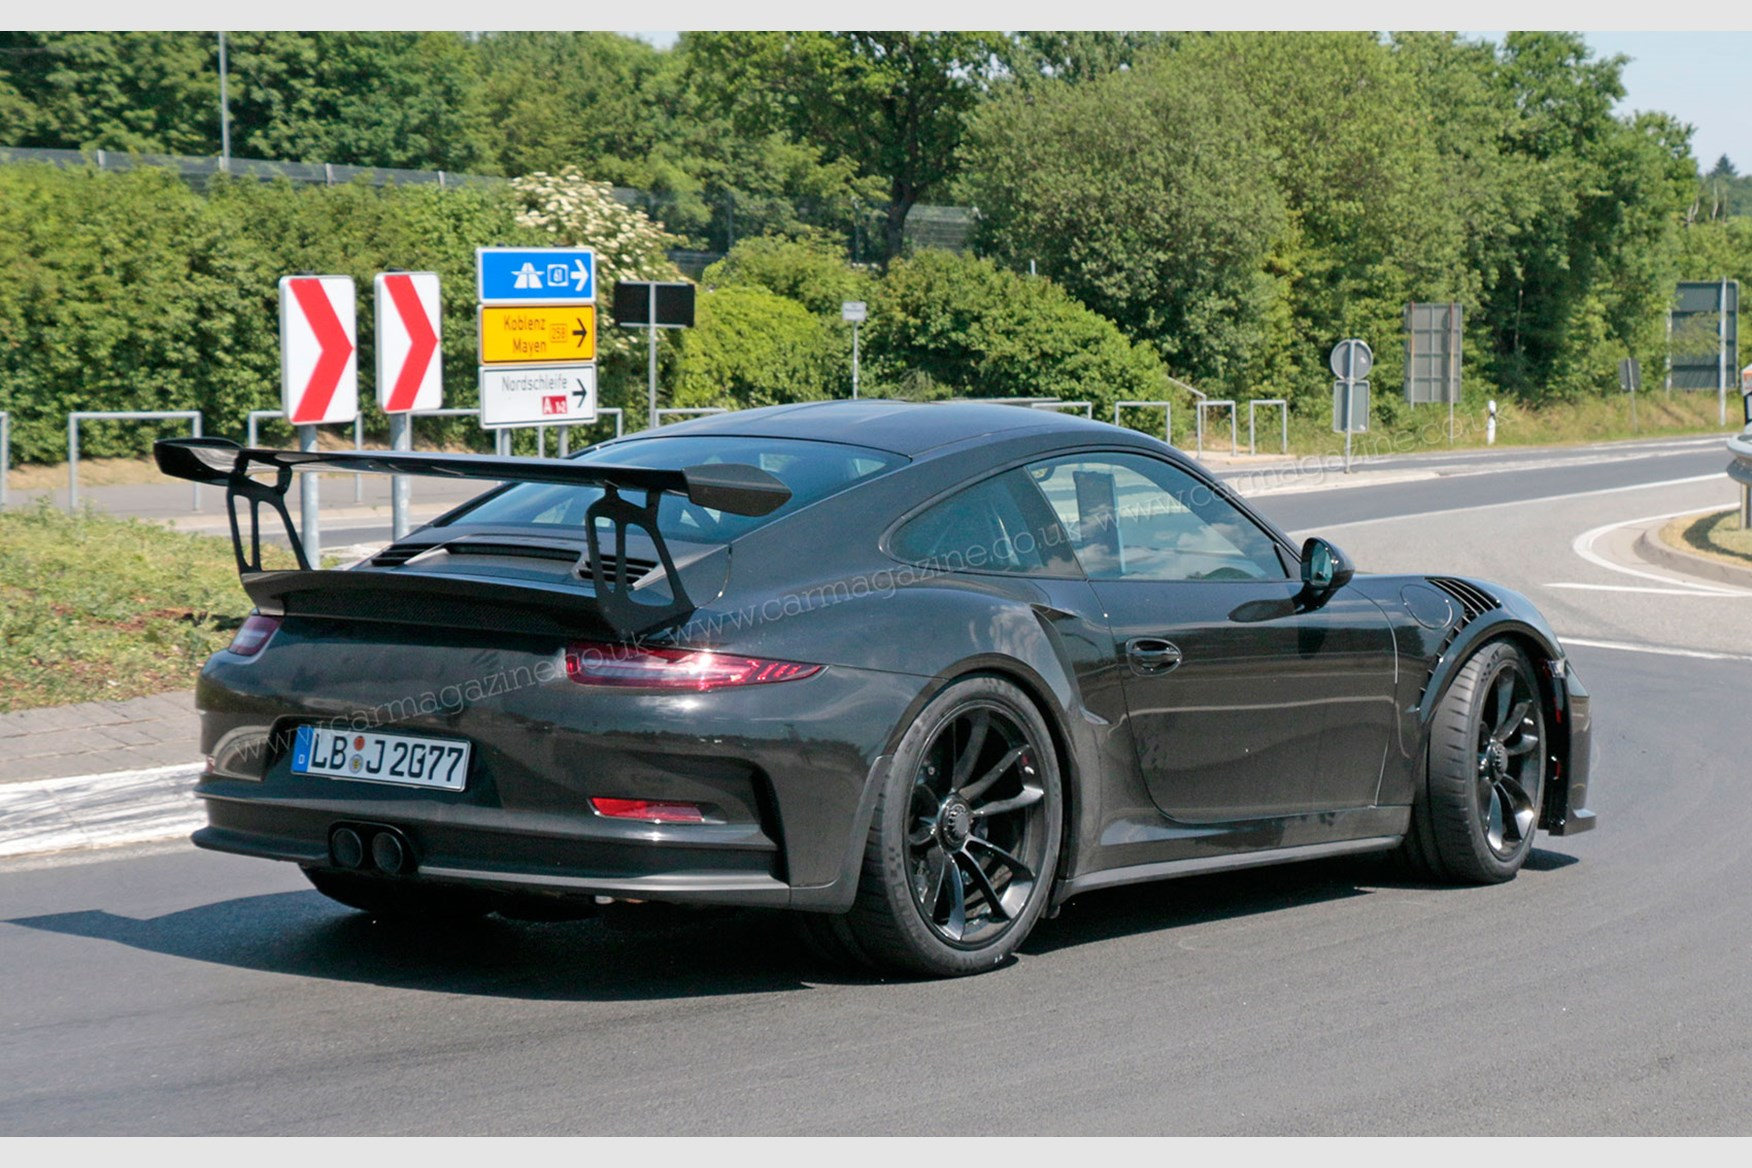 2018 porsche gt3 rs. Exellent Gt3 The New 2018 Porsche 911 GT3 RS Spyshots To Porsche Gt3 Rs